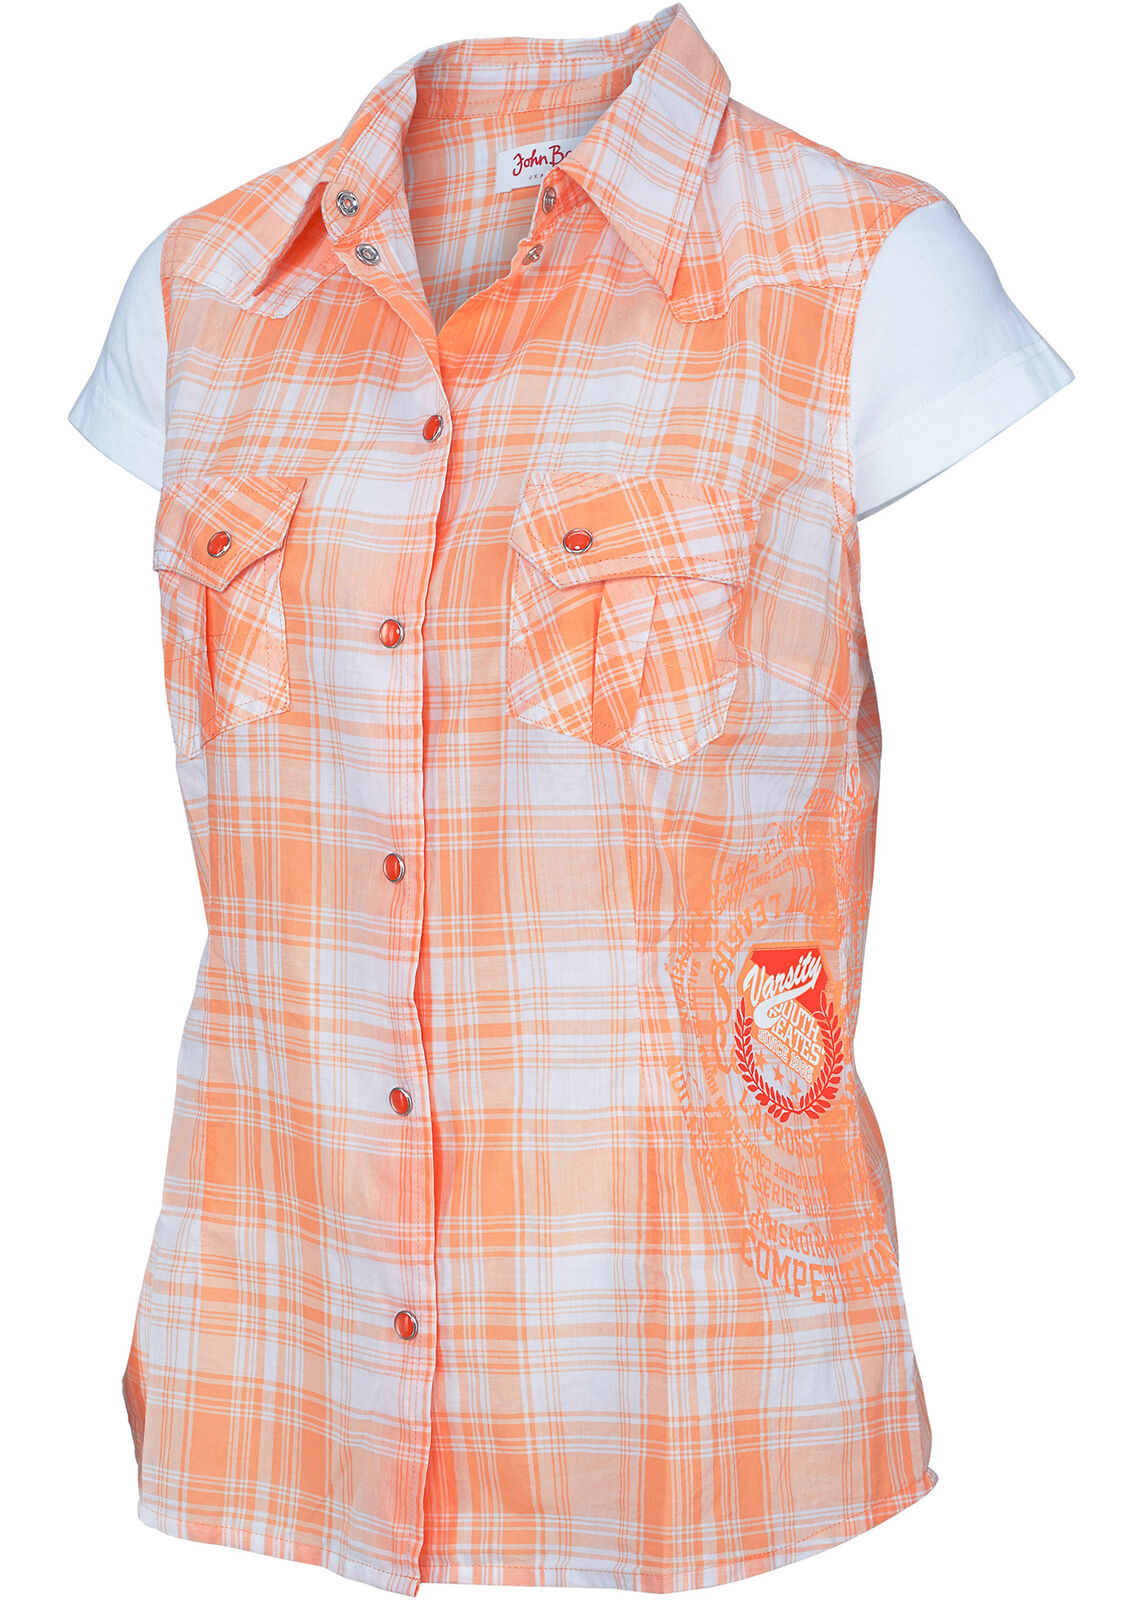 best service a12fb 14859 Damen Karo Hemd Apricose Bluse ohne Arm T- Shirt Tunika Top 951754